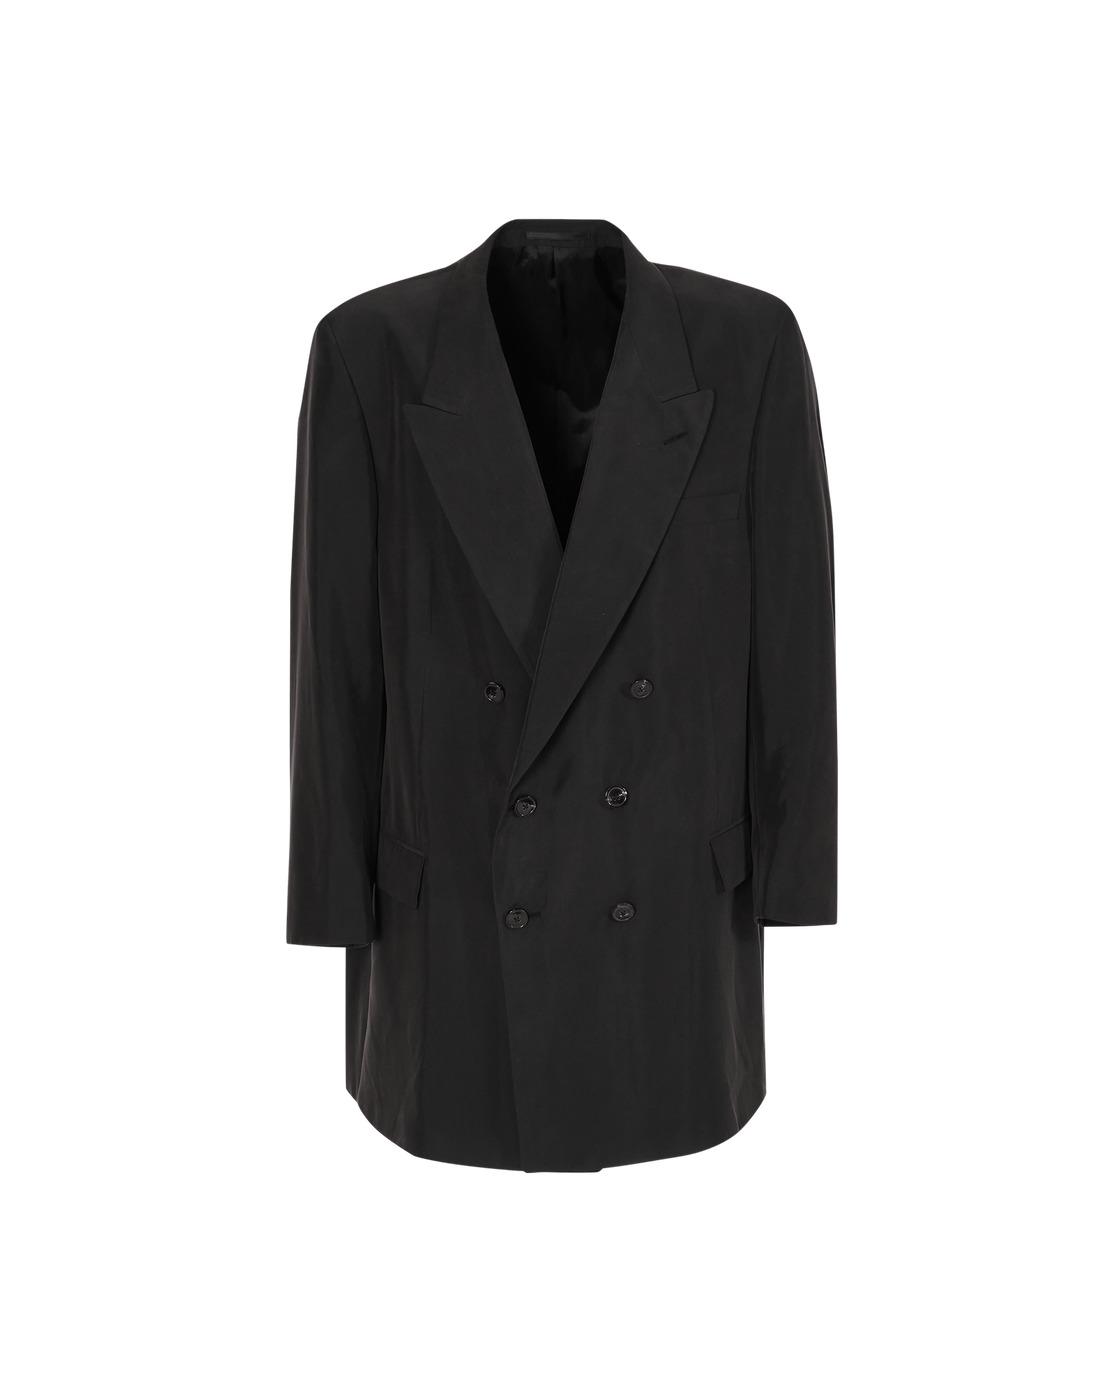 Martine Rose Double Breasted Oversized Blazer Black